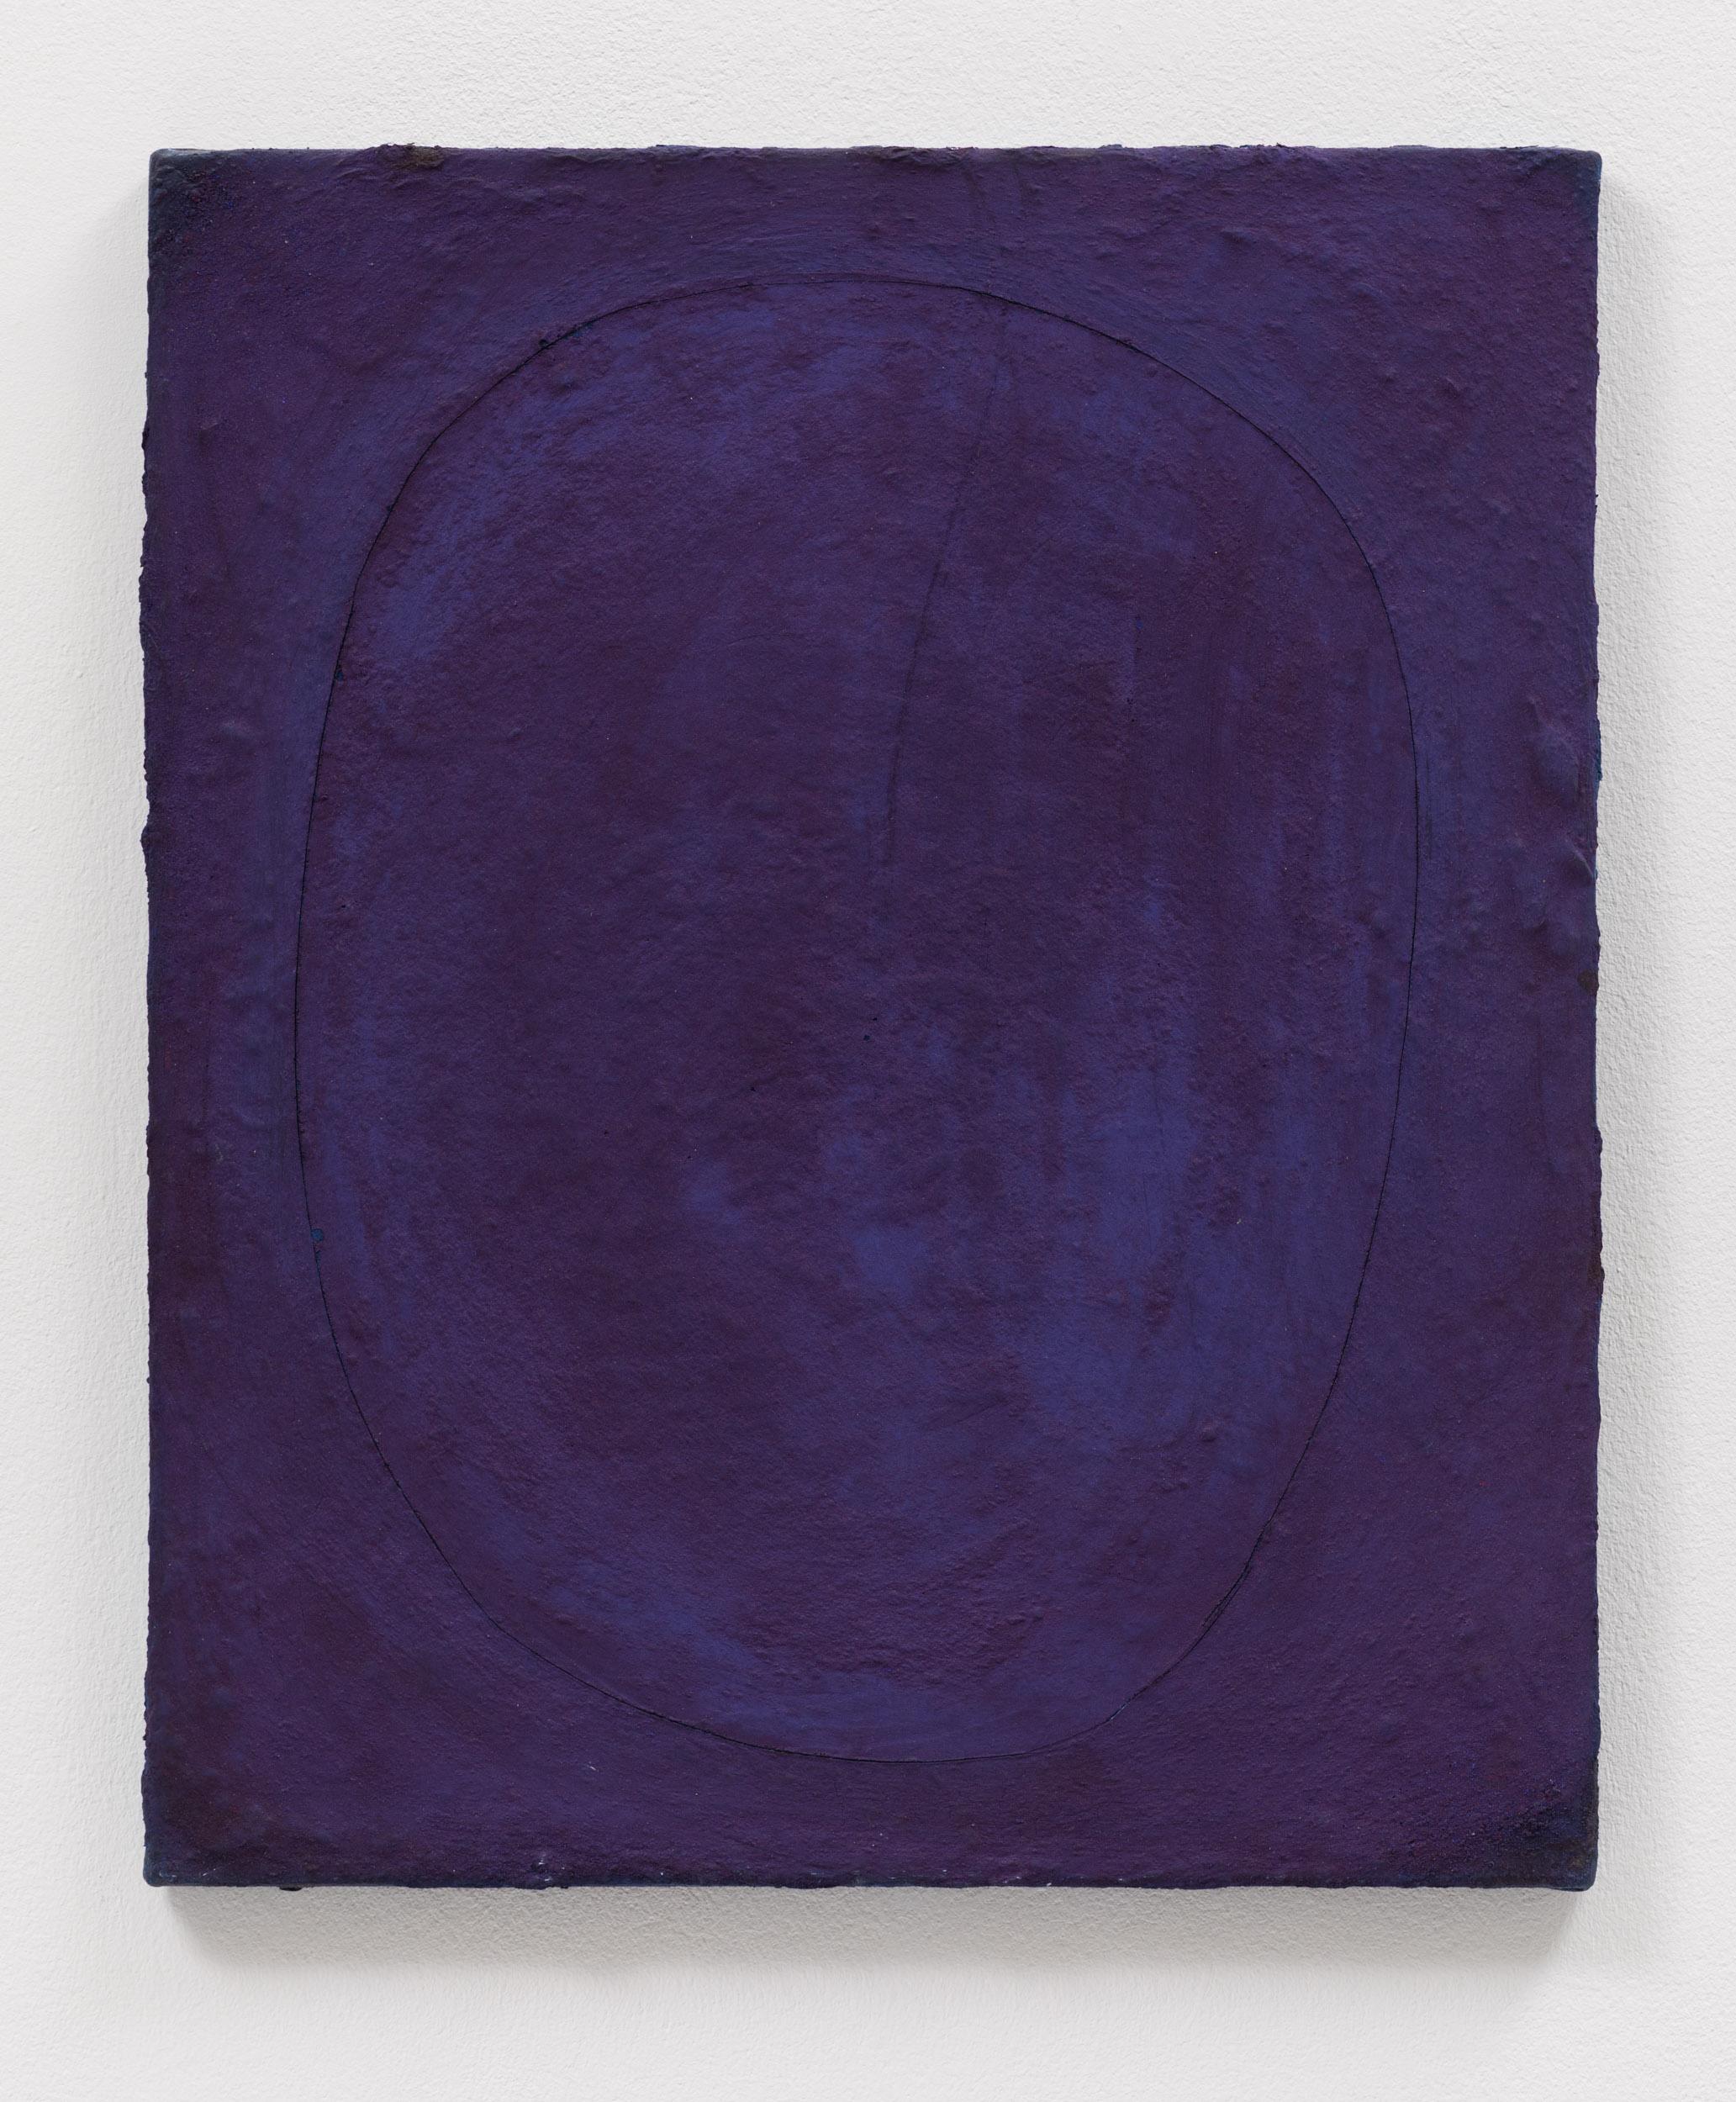 Toujours, 2019, Öl/Pigment auf Leinwand, 60x50cm